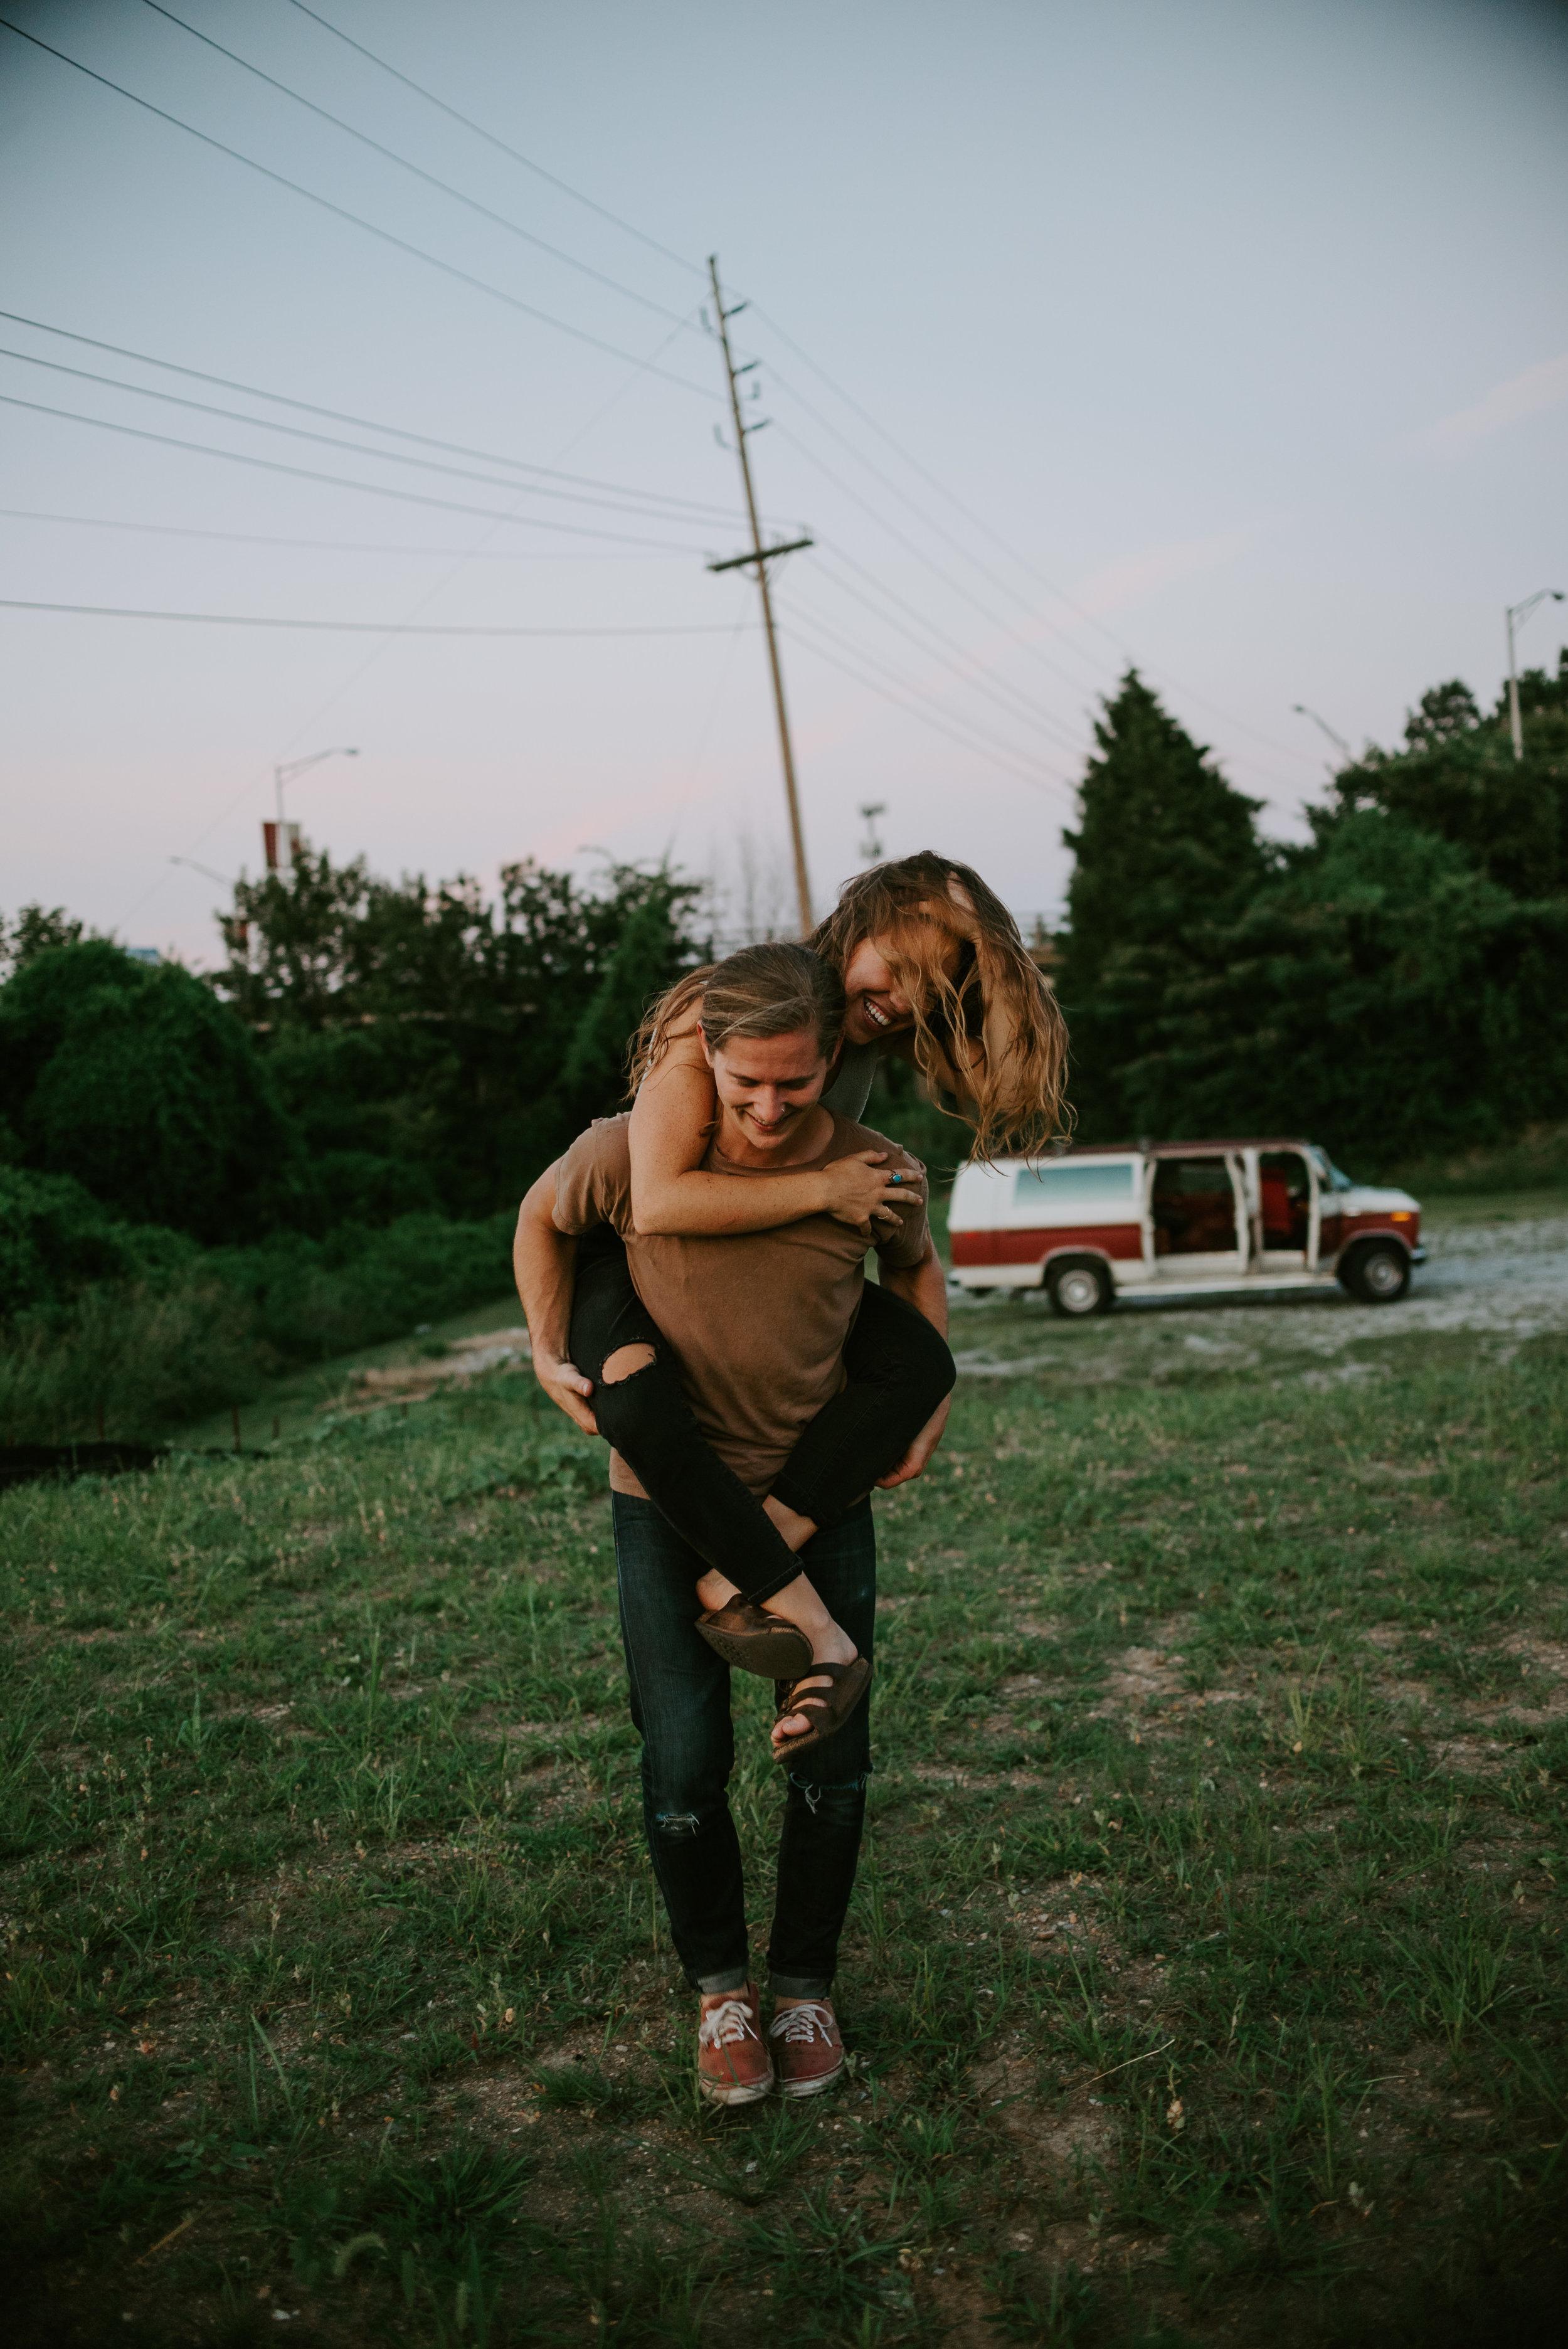 WonderlyCreative_Couples_7.9.18_Cameron&Alexis_-309.jpg